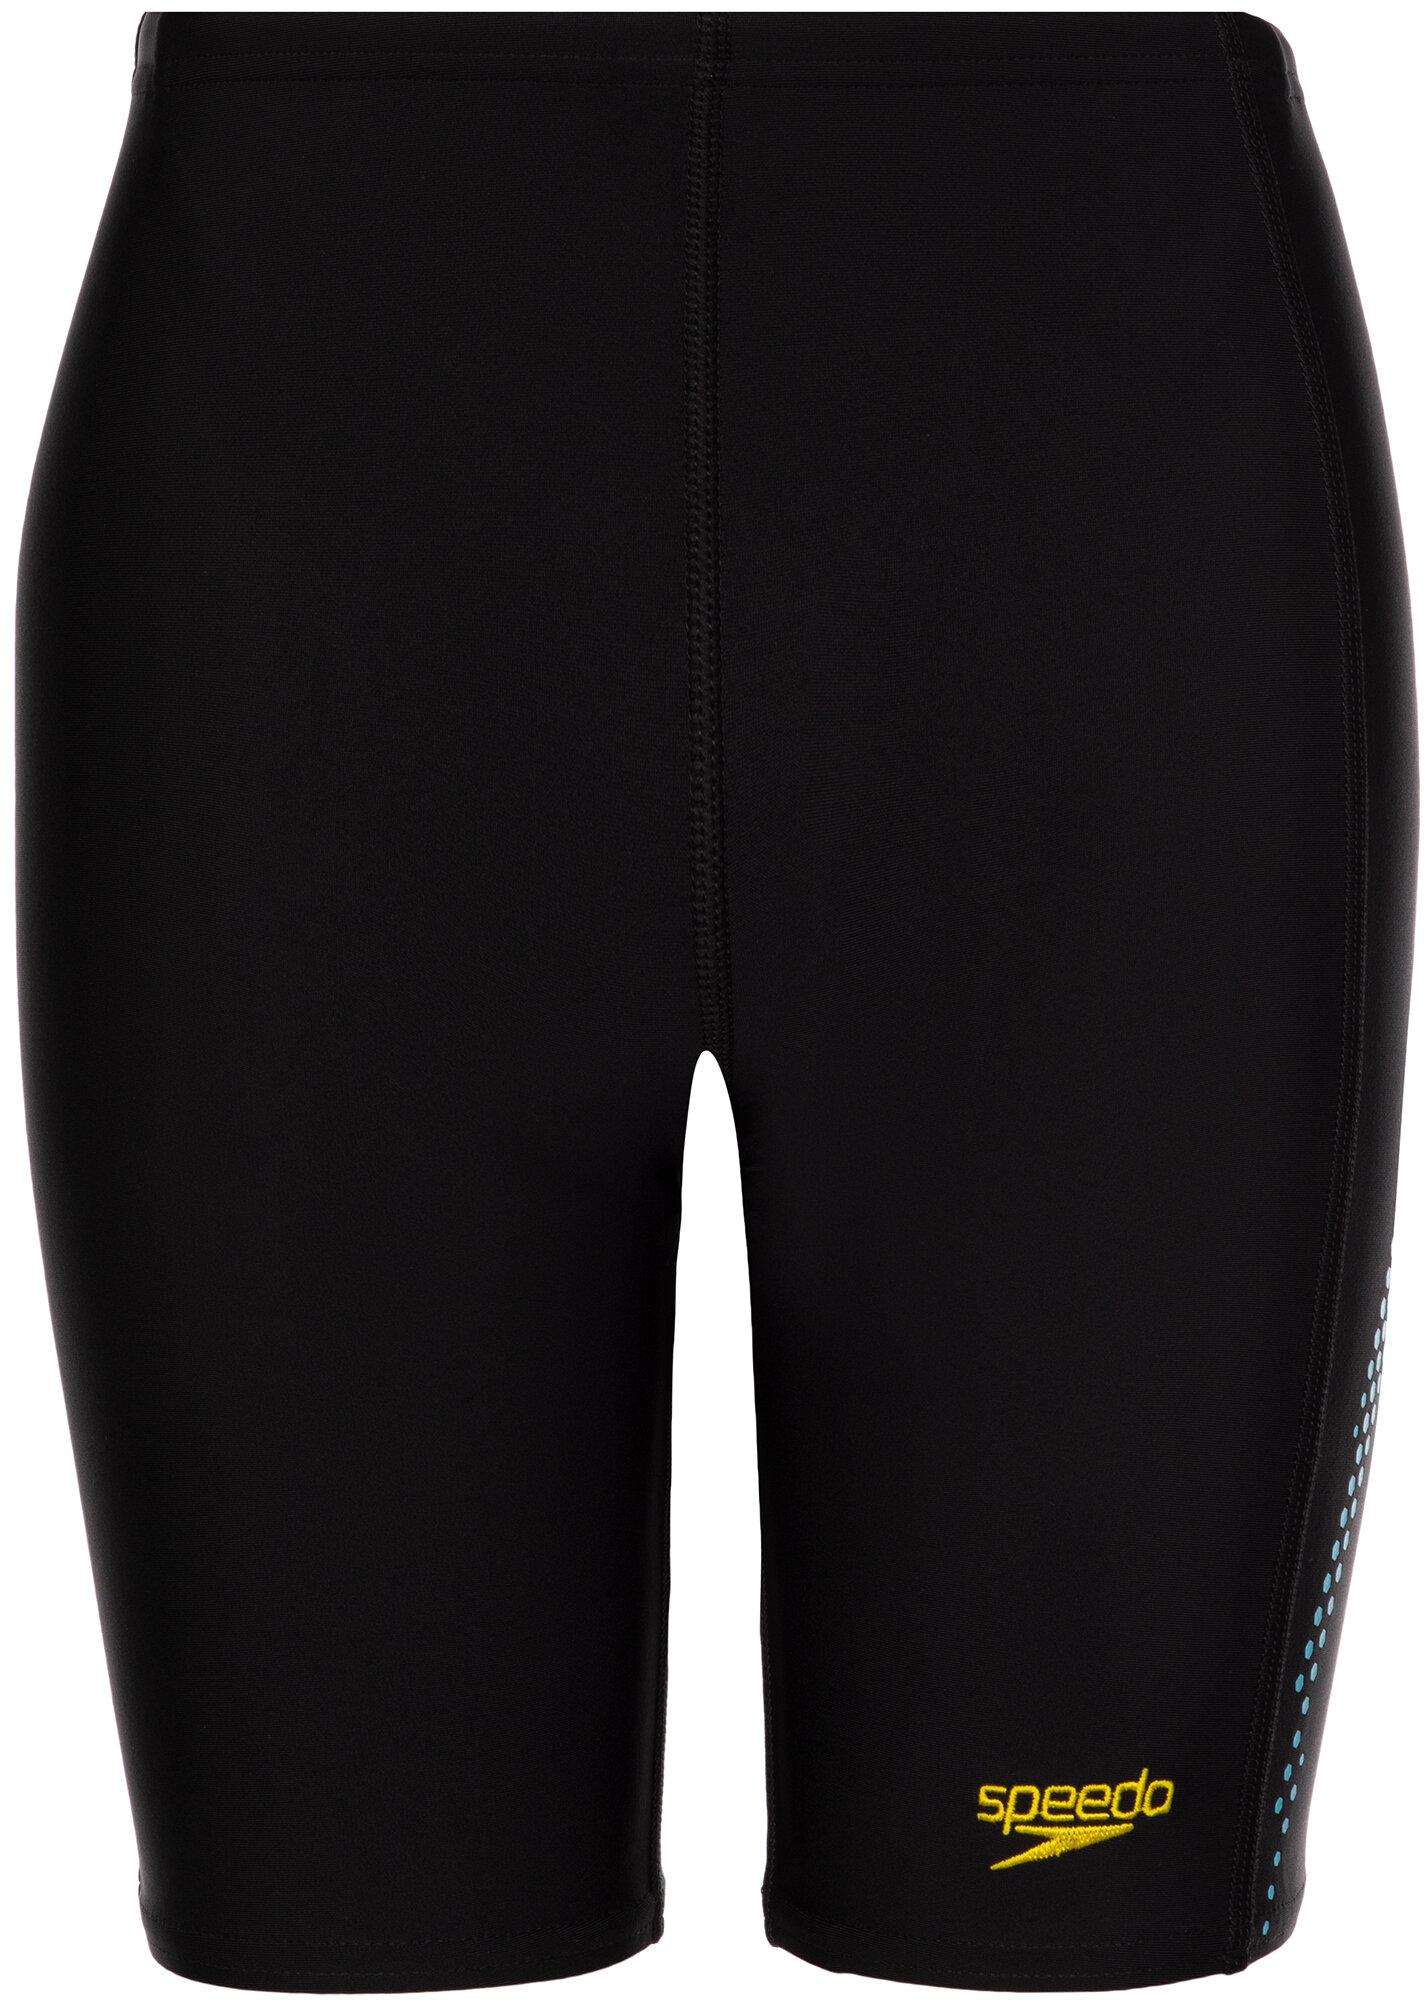 Speedo Плавки-шорты для мальчиков Speedo, размер 140